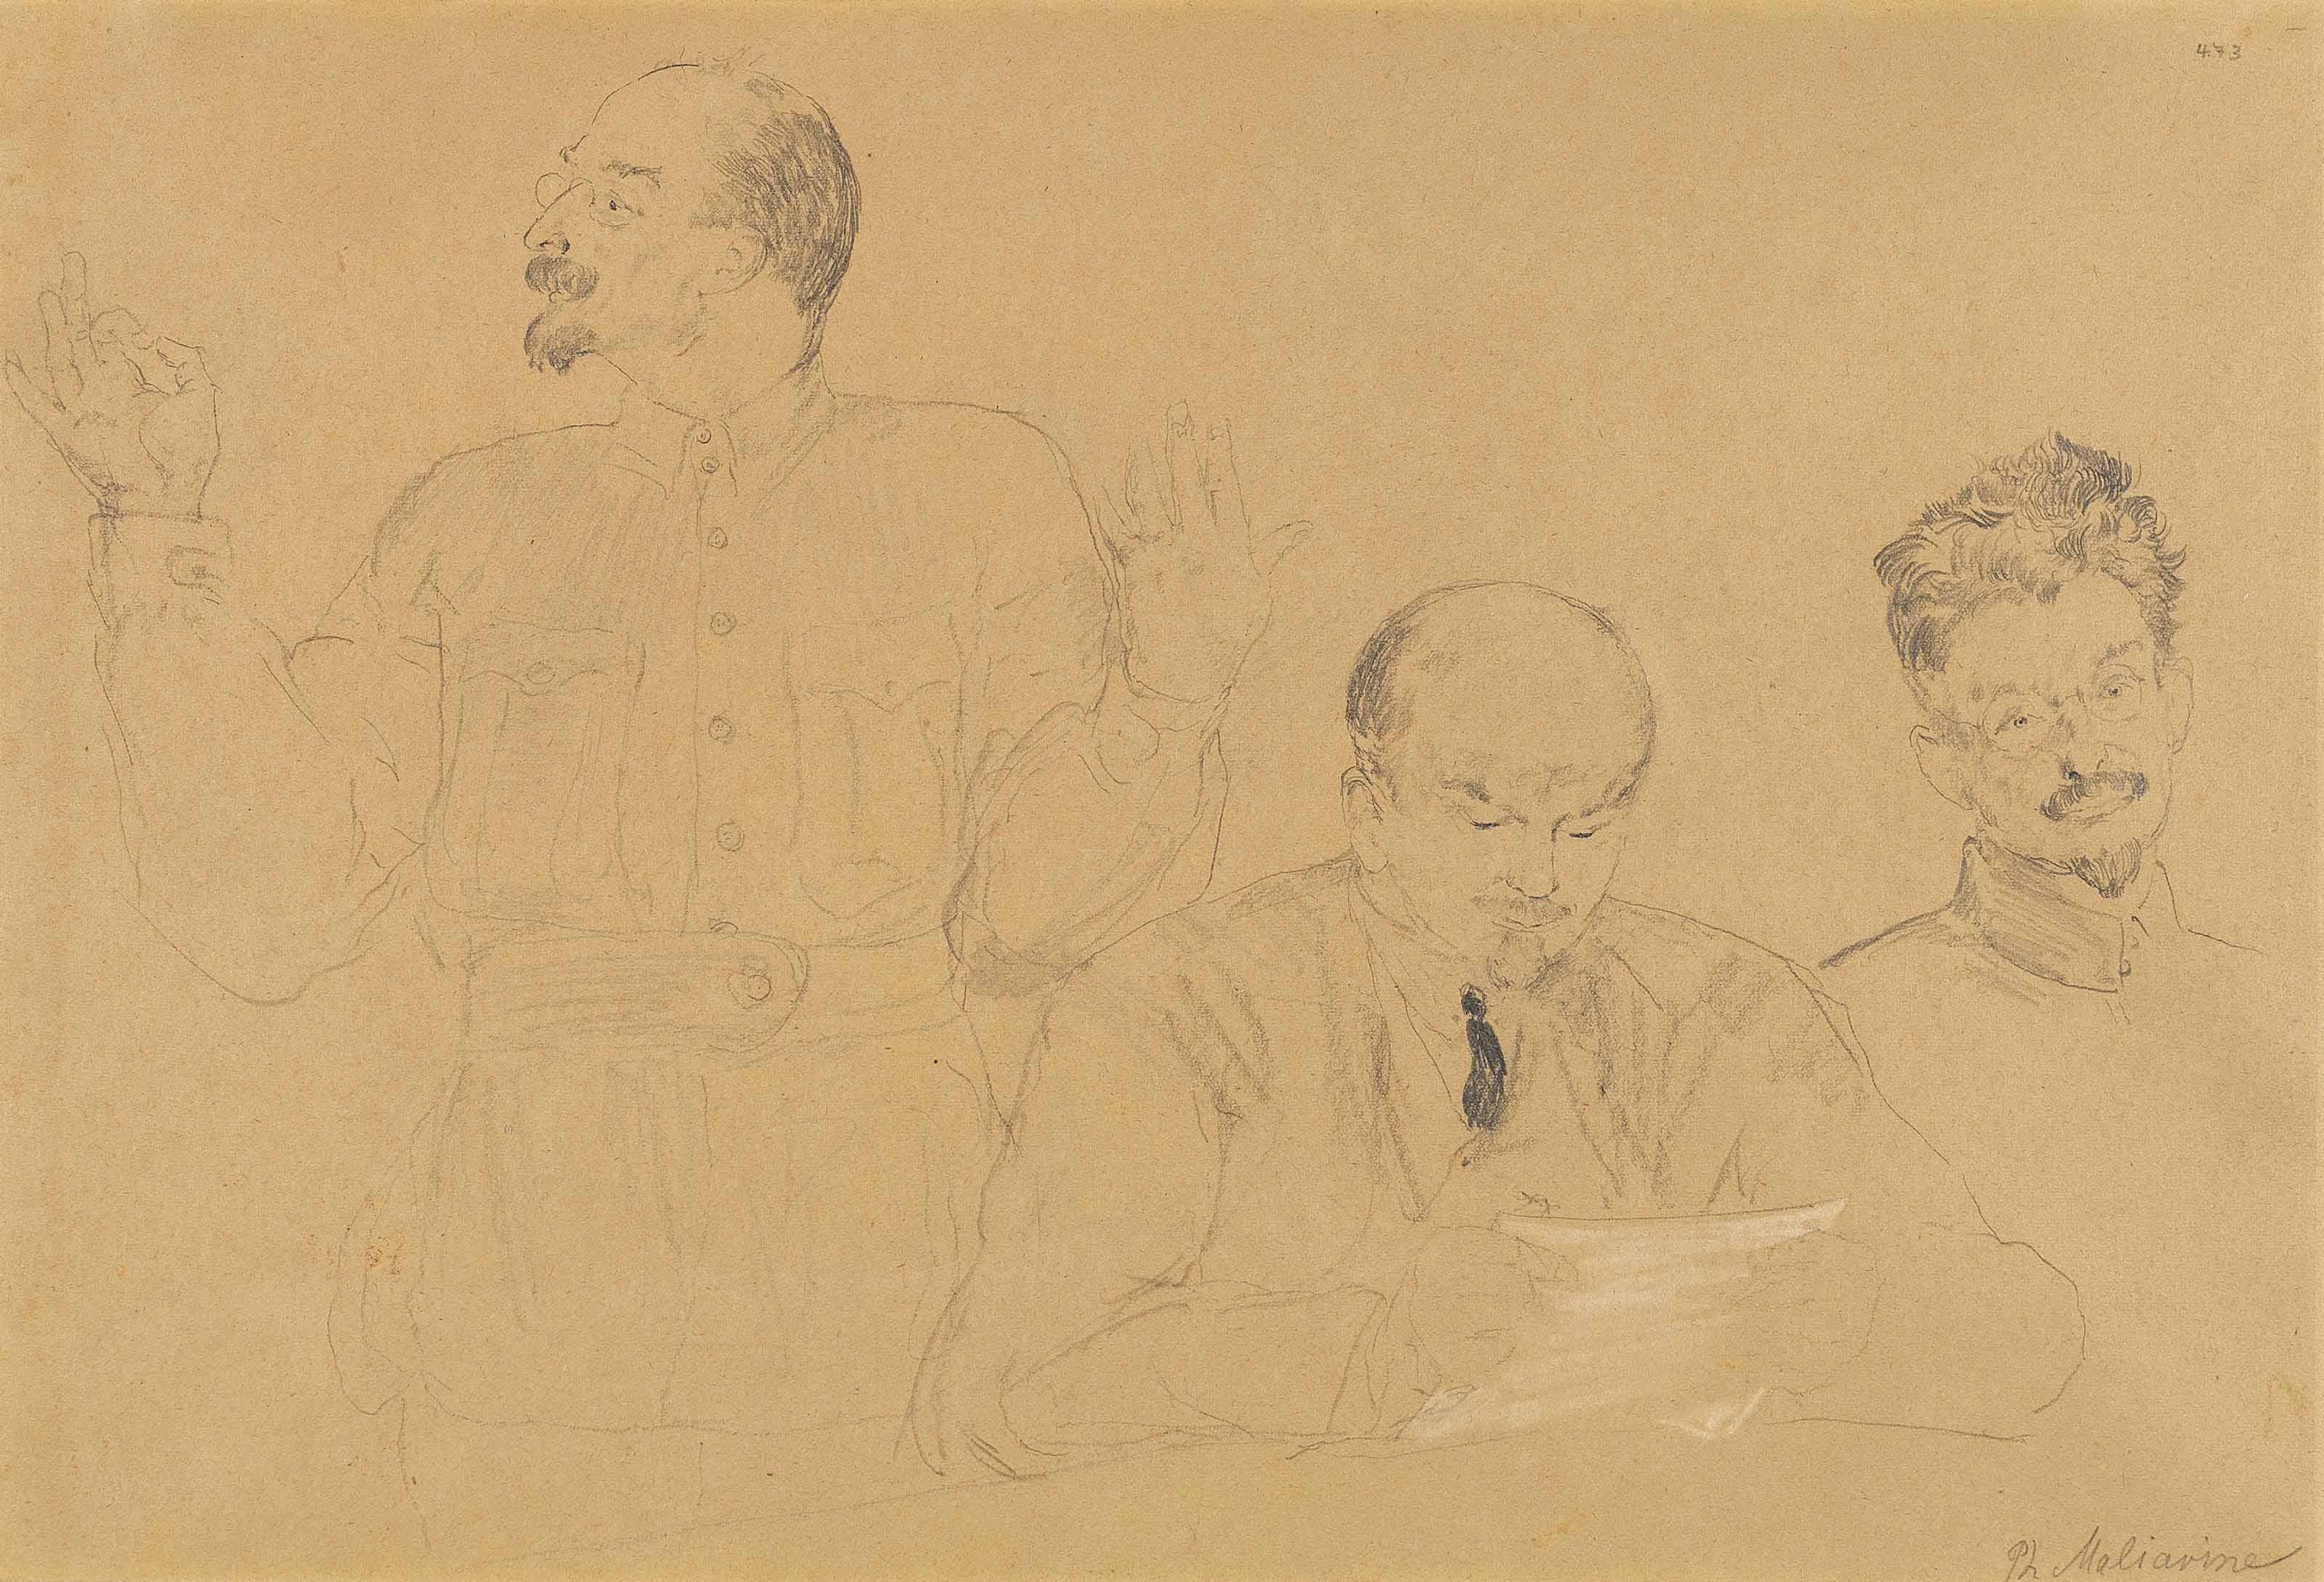 Anatoly Lunacharsky (1875-1933), Vladimir Lenin (1870-1924) and Leon Trotsky (1879-1940)